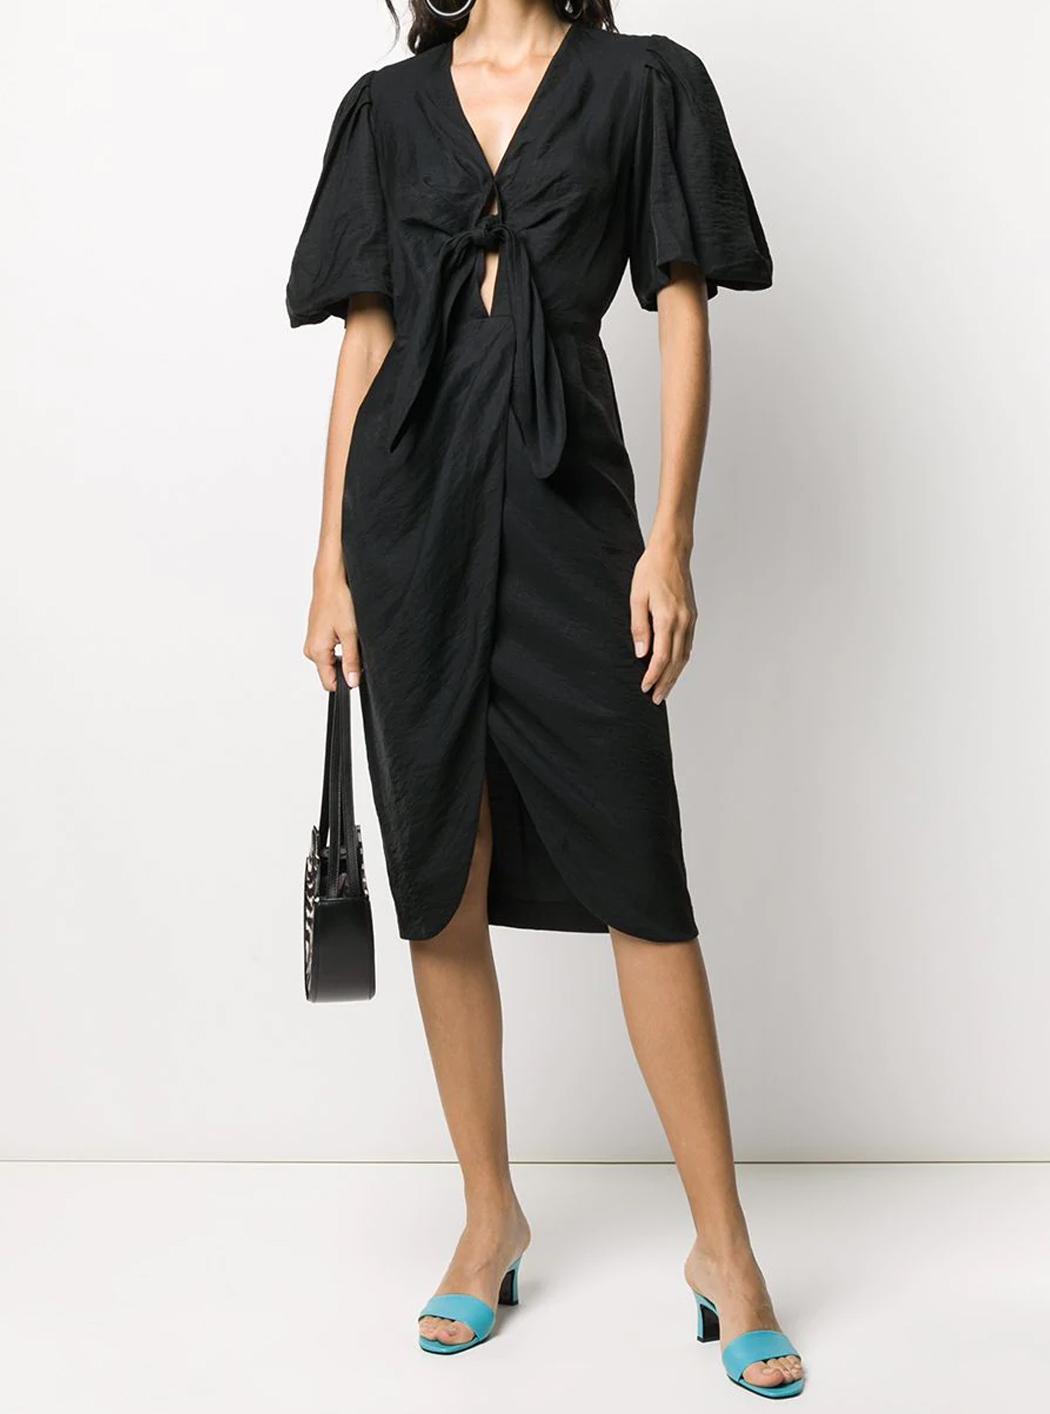 sandro dress sale